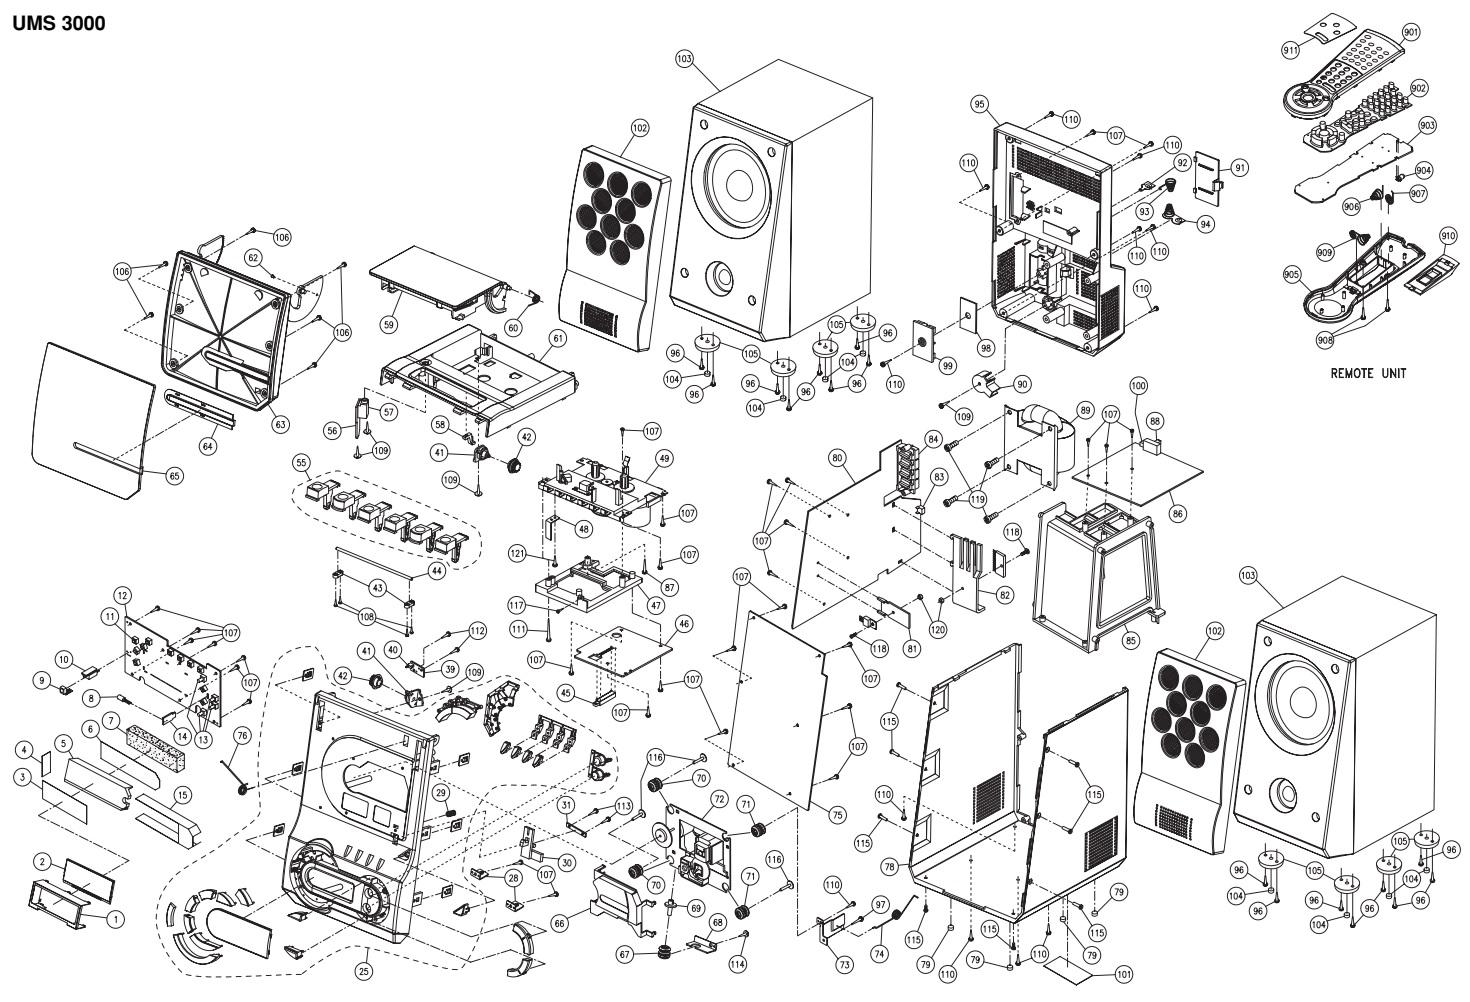 Master Electronics Repair Grundig Ums Glr